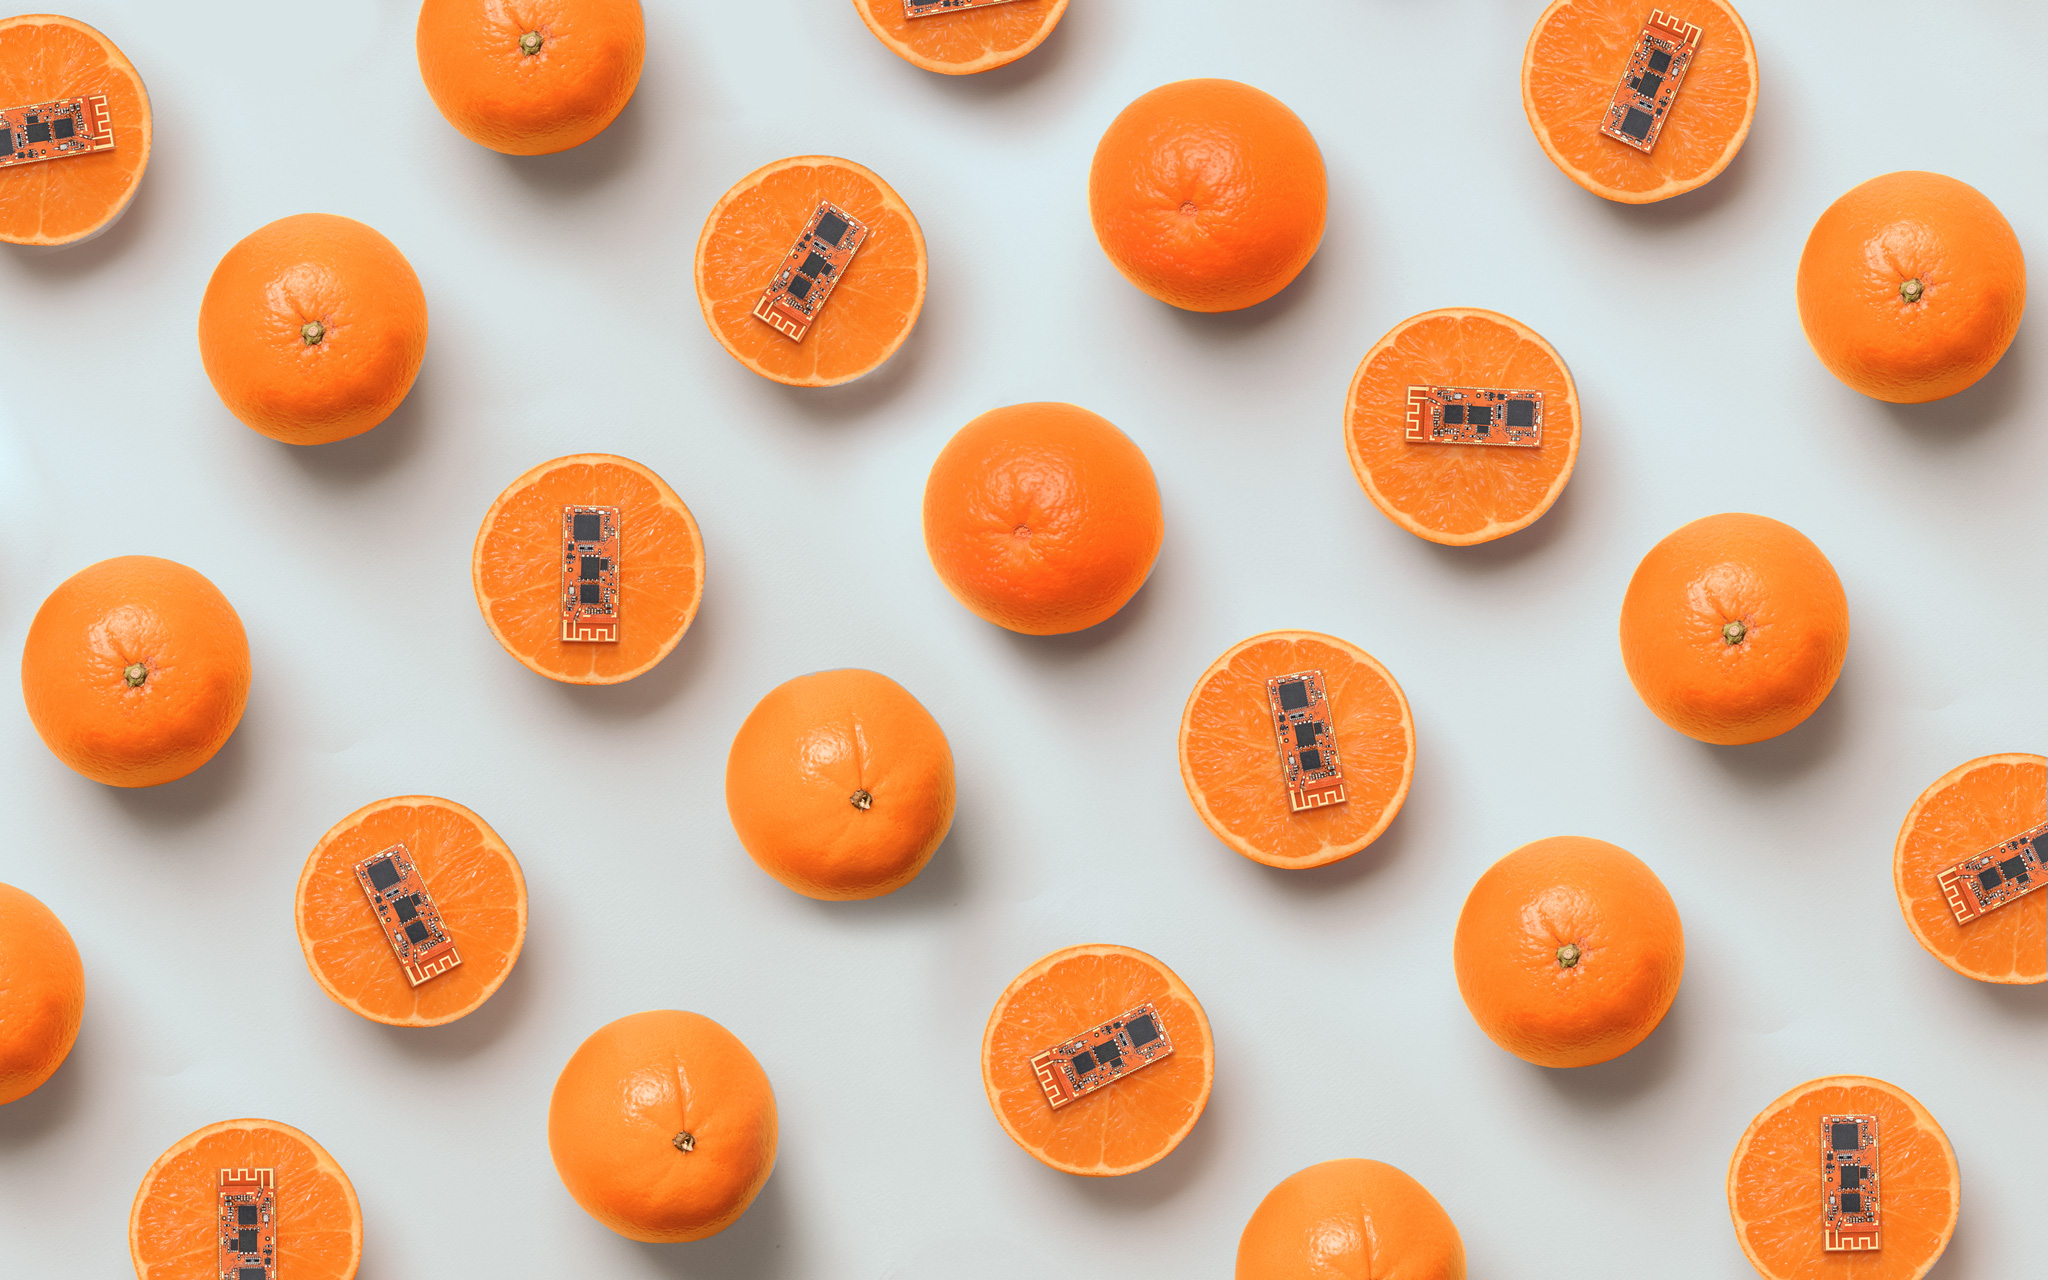 Meteca-why-orange